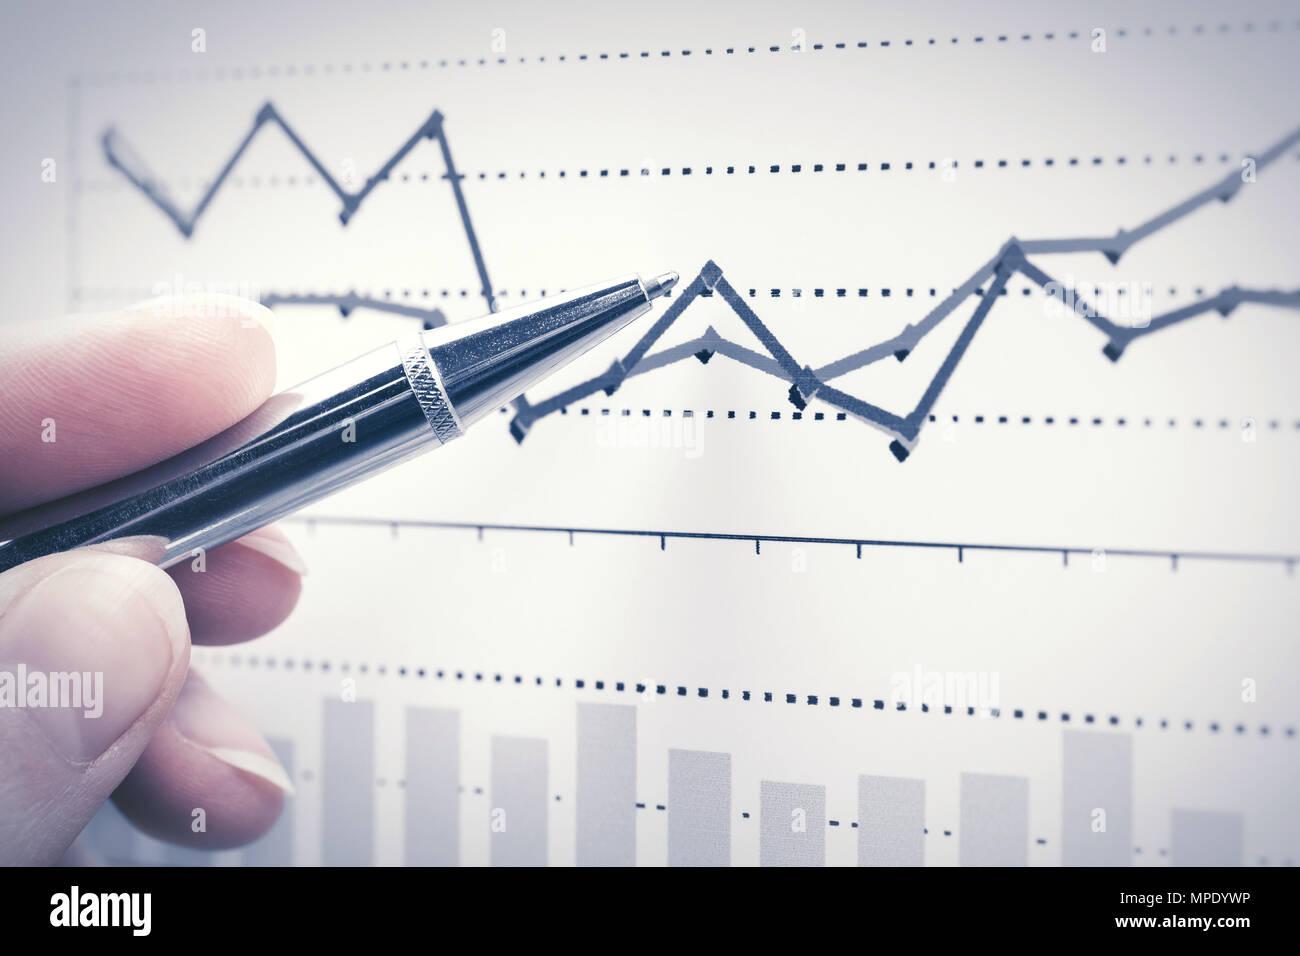 financial graphs analysis stock